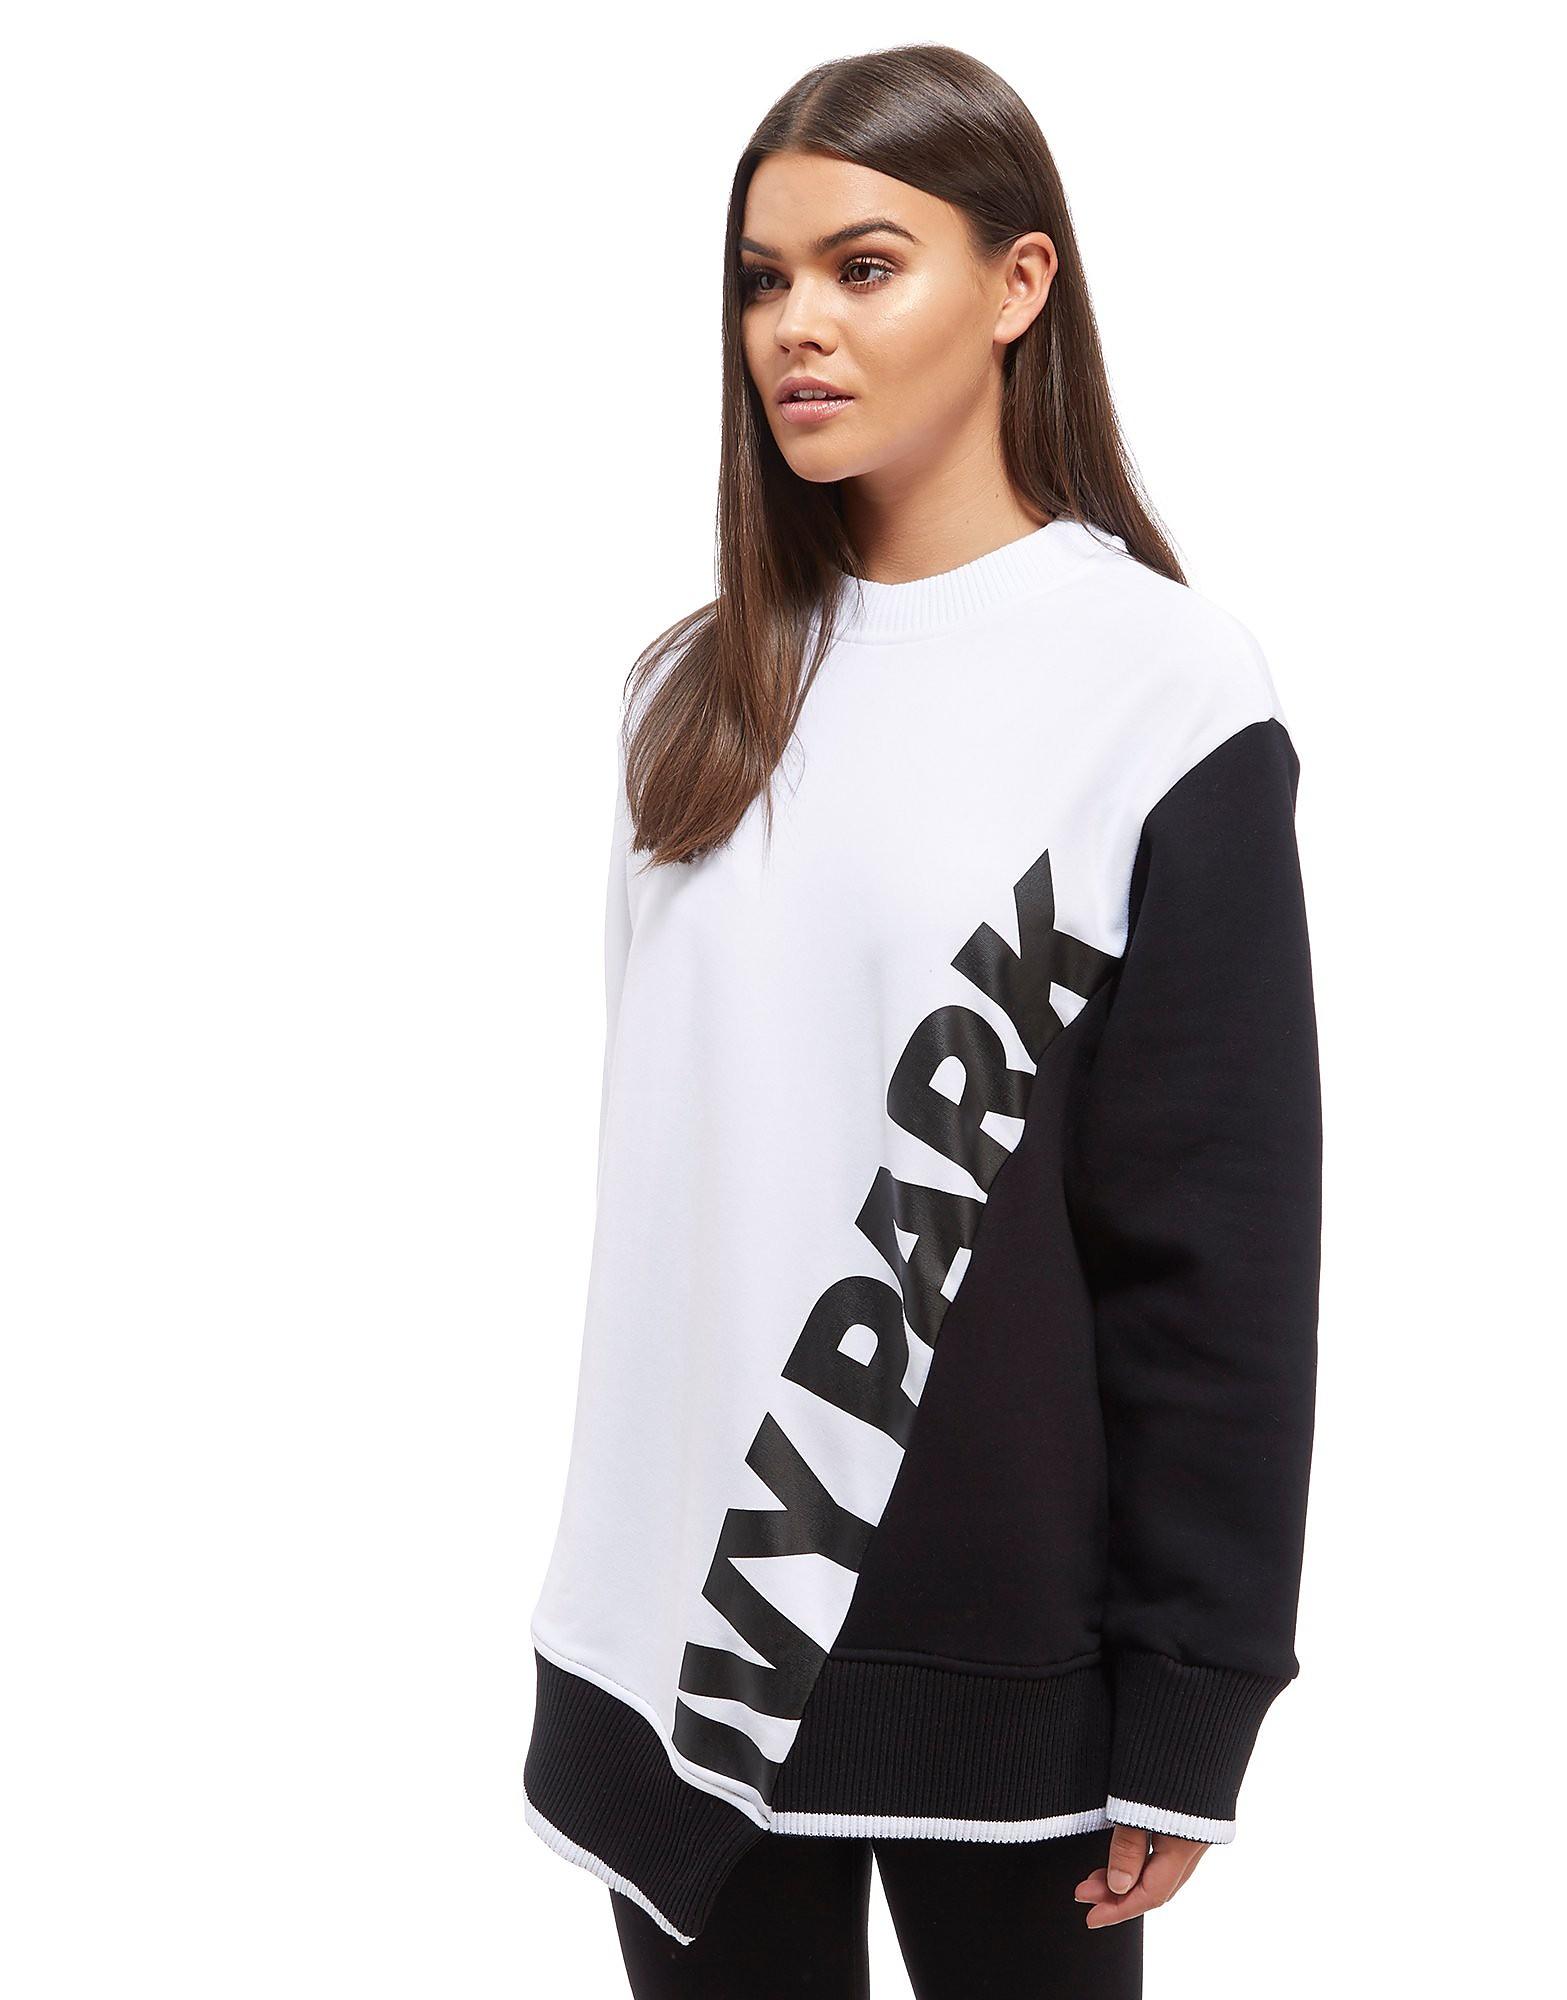 IVY PARK Asymetric Sweatshirt